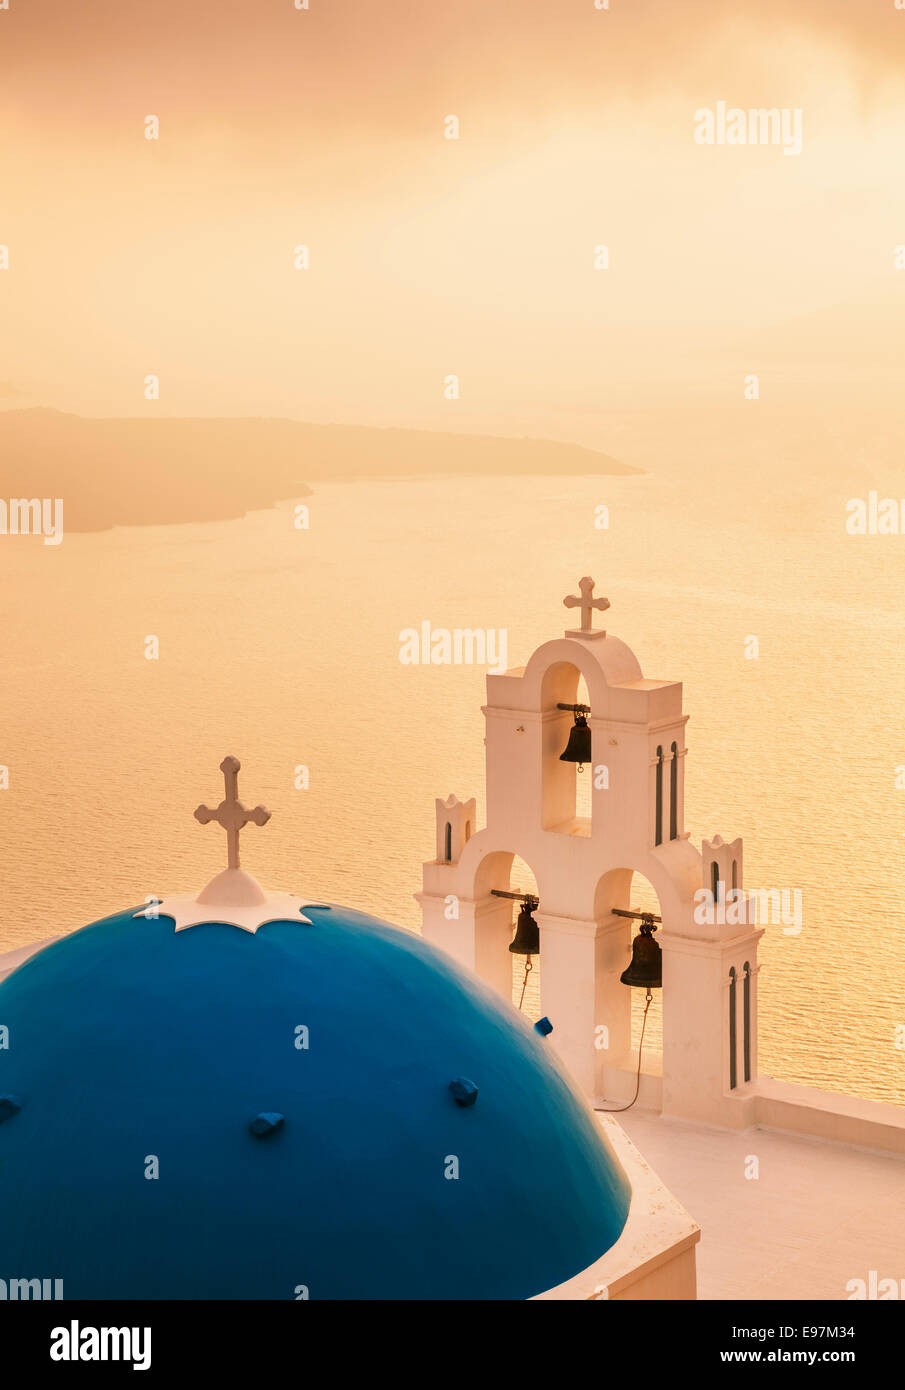 St Gerasimos church at sunset , Firostefani, Fira, Santorini, Thira, Cyclades islands, Aegean Sea, Greece, EU, Europe - Stock Image